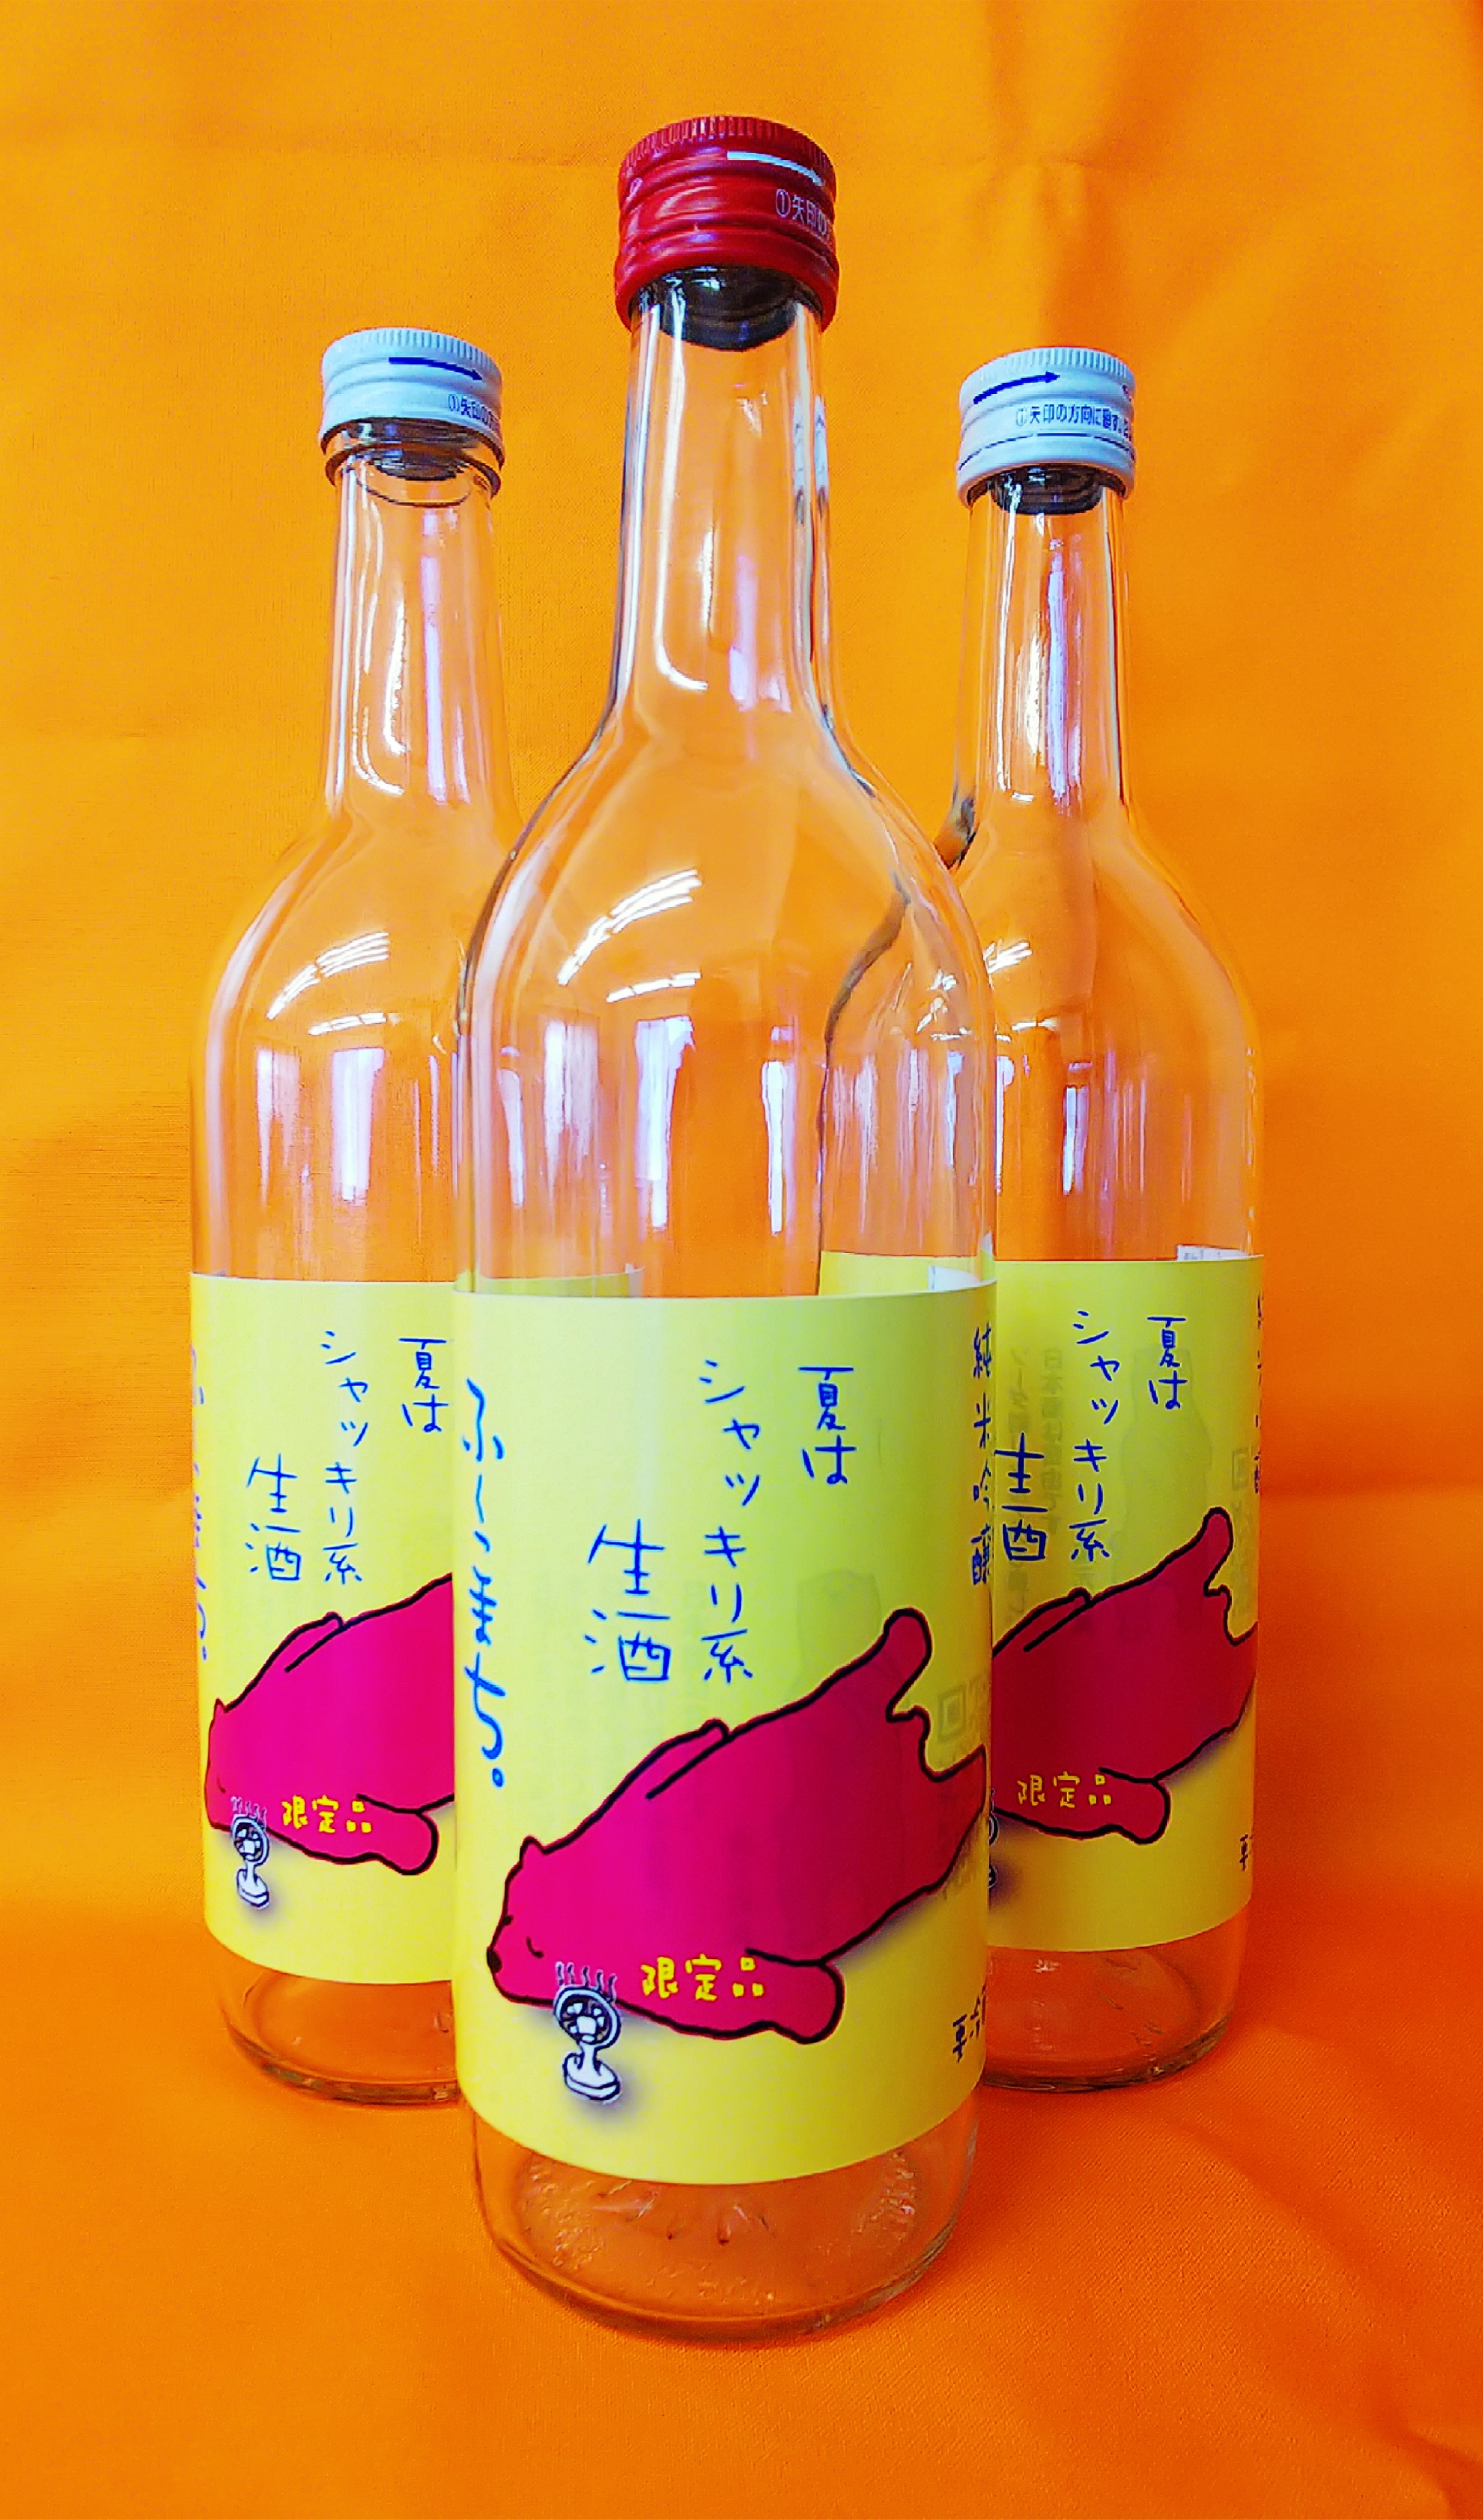 http://www.fukukomachi.com/blog/photo/C360_20210714-153349-96.jpg